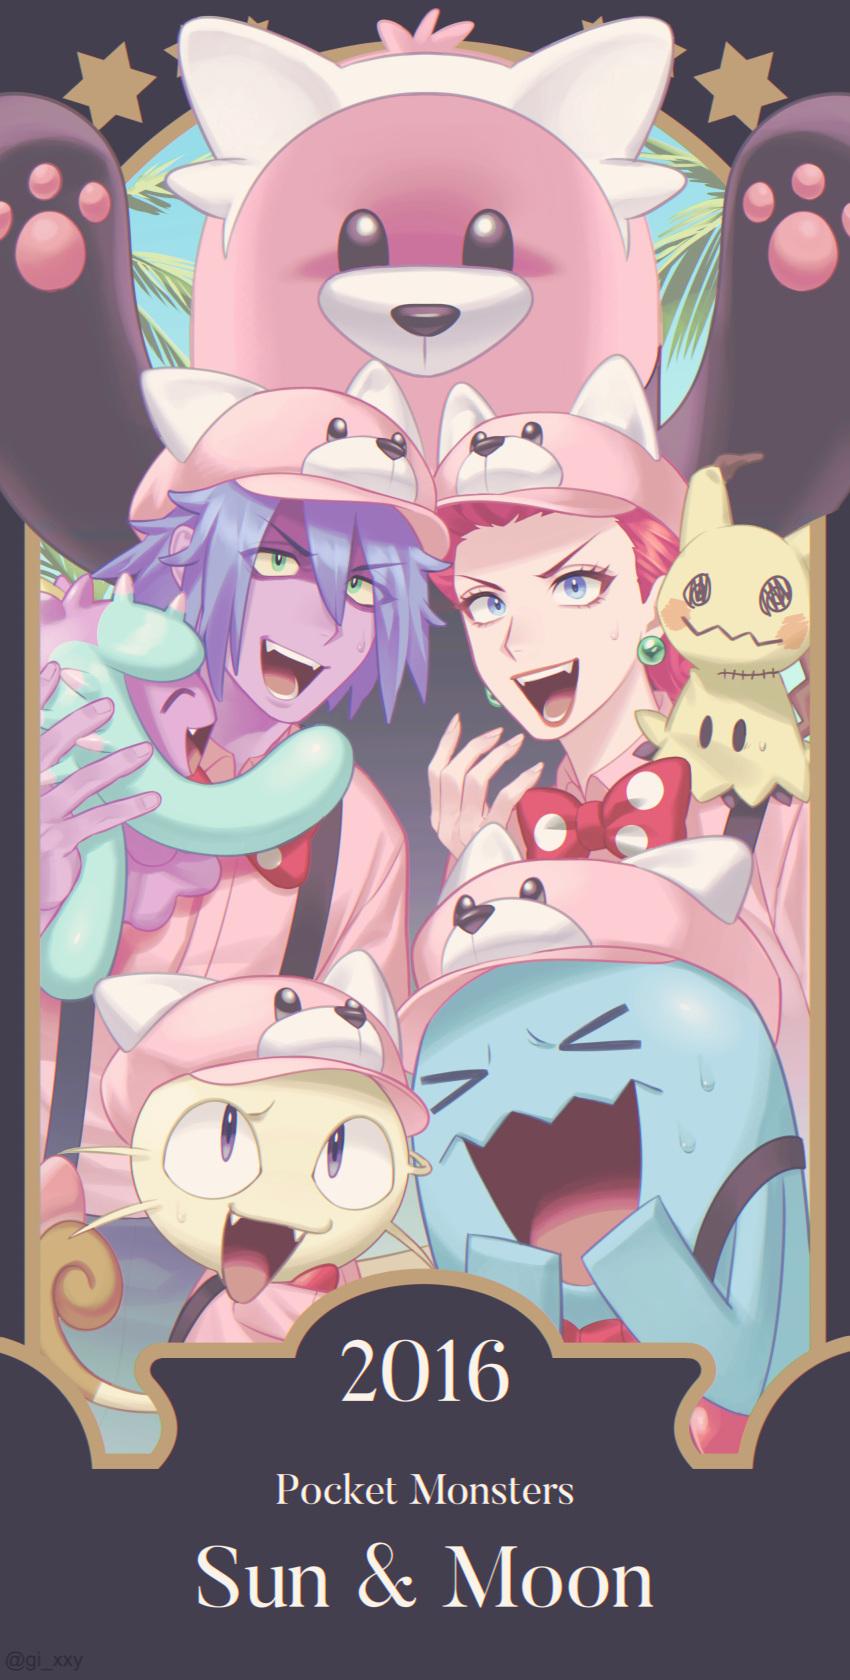 1boy 1girl :d absurdres bewear blue_eyes blue_hair bow bowtie colored_skin commentary_request copyright_name earrings eyelashes gen_1_pokemon gen_2_pokemon gen_7_pokemon green_eyes hat highres james_(pokemon) jessie_(pokemon) jewelry long_hair mareanie meowth mimikyu number on_shoulder open_mouth pink_headwear pink_shirt pokemon pokemon_(anime) pokemon_(creature) pokemon_on_shoulder pokemon_sm_(anime) polka_dot_neckwear purple_skin red_neckwear redhead ruru_(gi_xxy) shirt smile star_(symbol) suspenders team_rocket teeth tongue wobbuffet